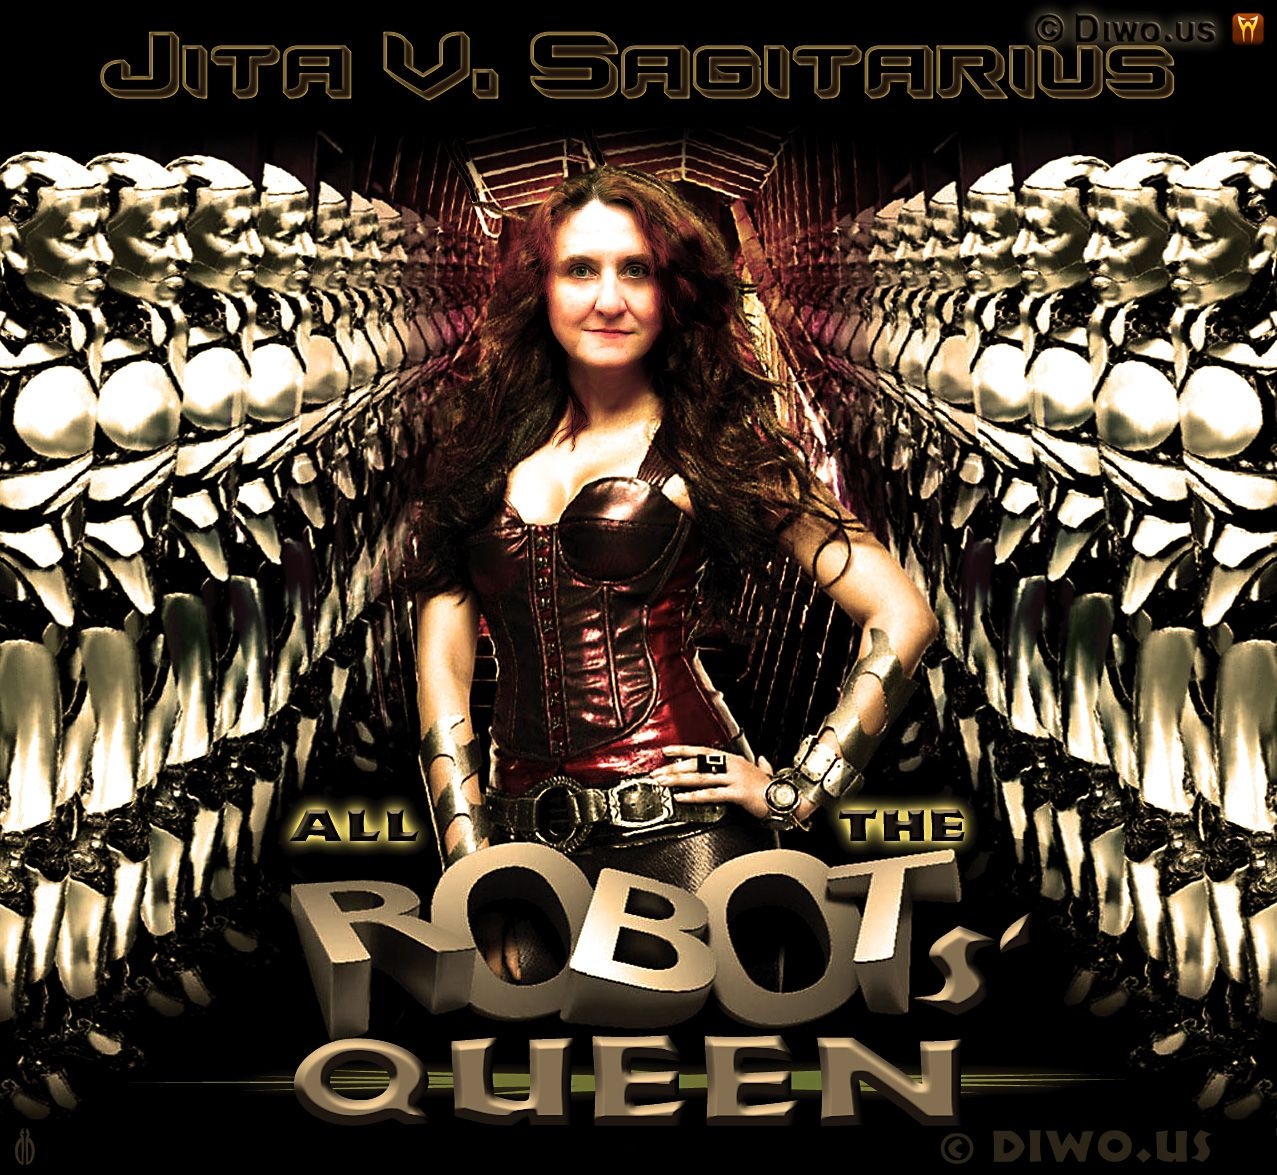 Diwous - Královna robotů Jita V. Sagitarius, Robots' Queen, robot